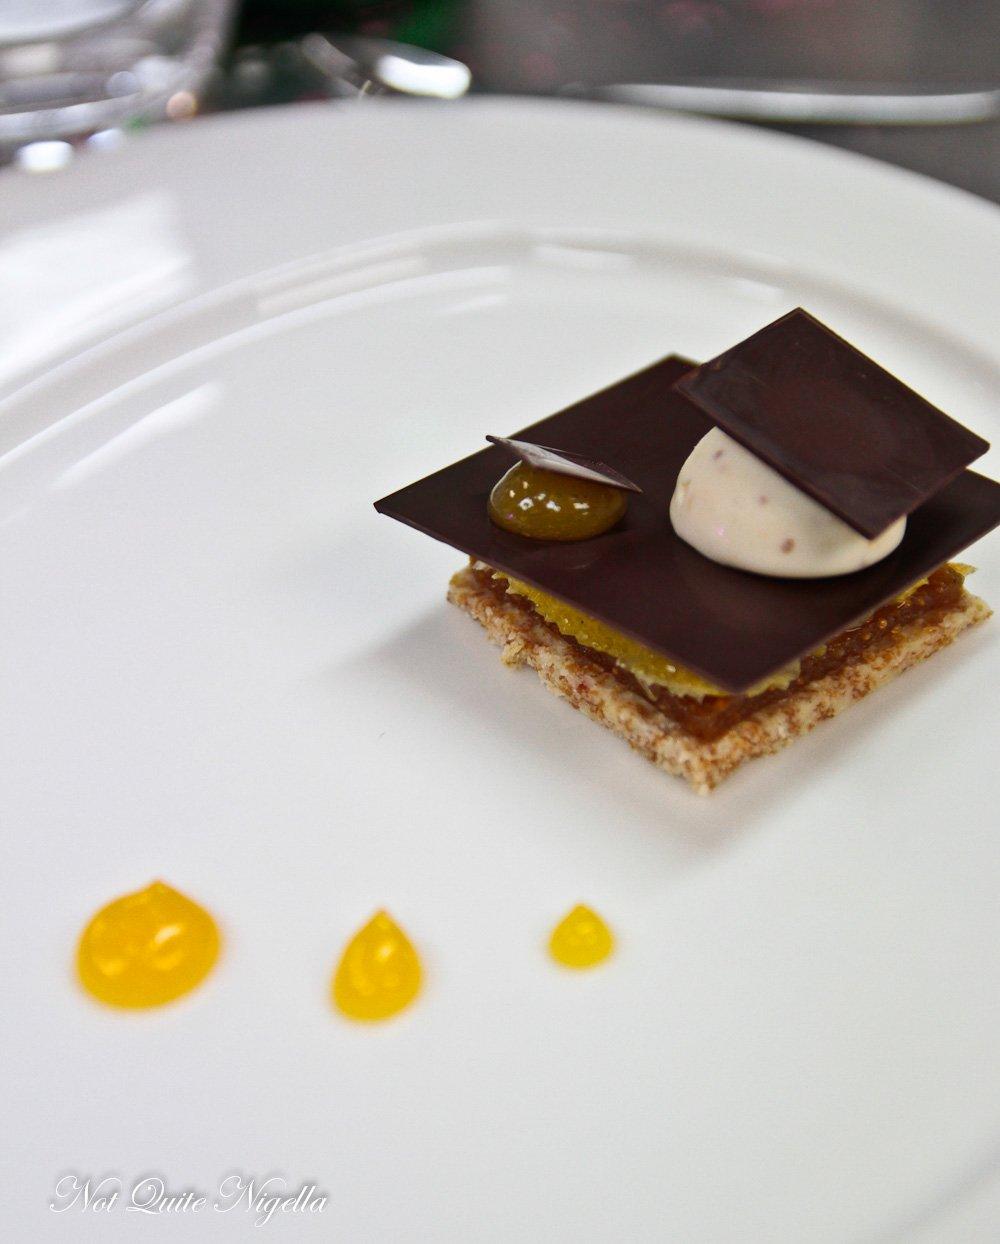 Shangri-La Hotel Gelato Messina Dessert Degustation